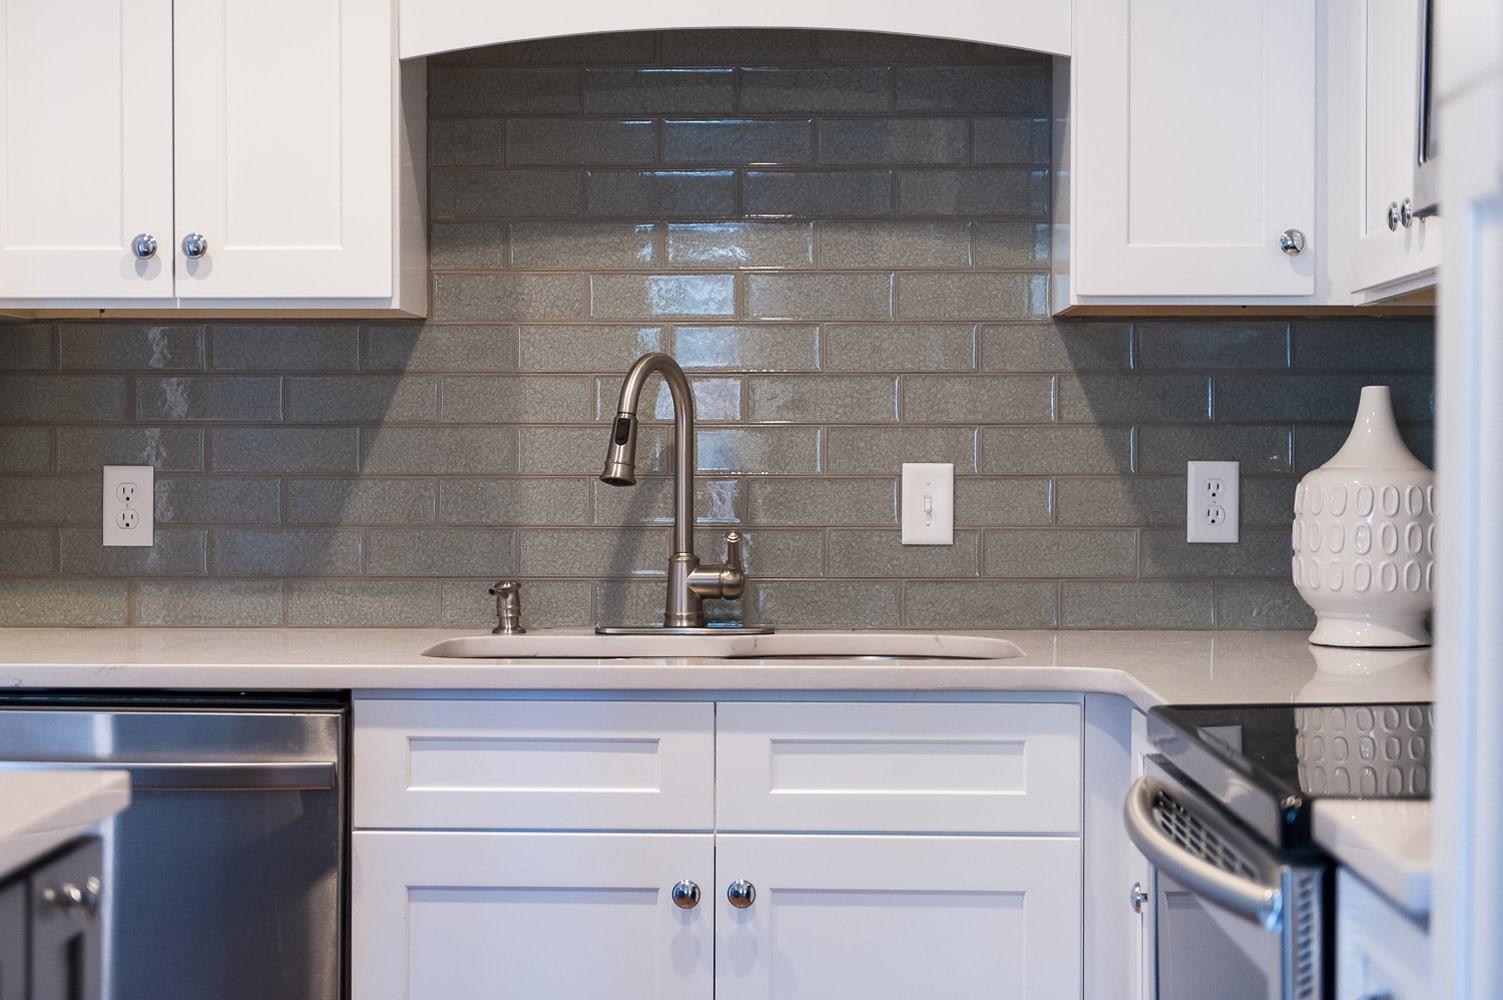 Wieuca Road kitchen interior design in Atlanta